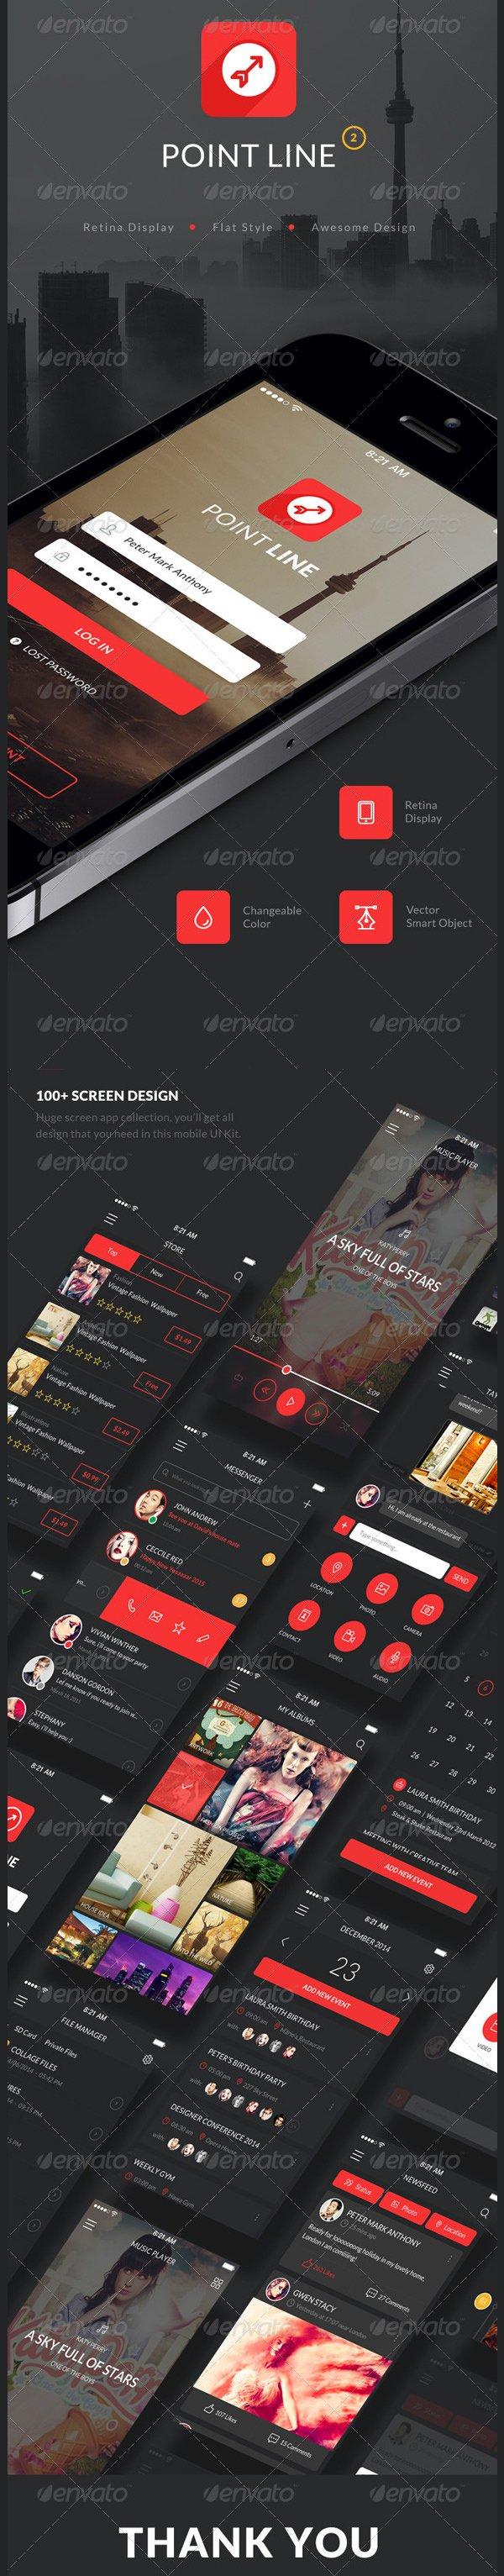 point flat mobile app ui kit1